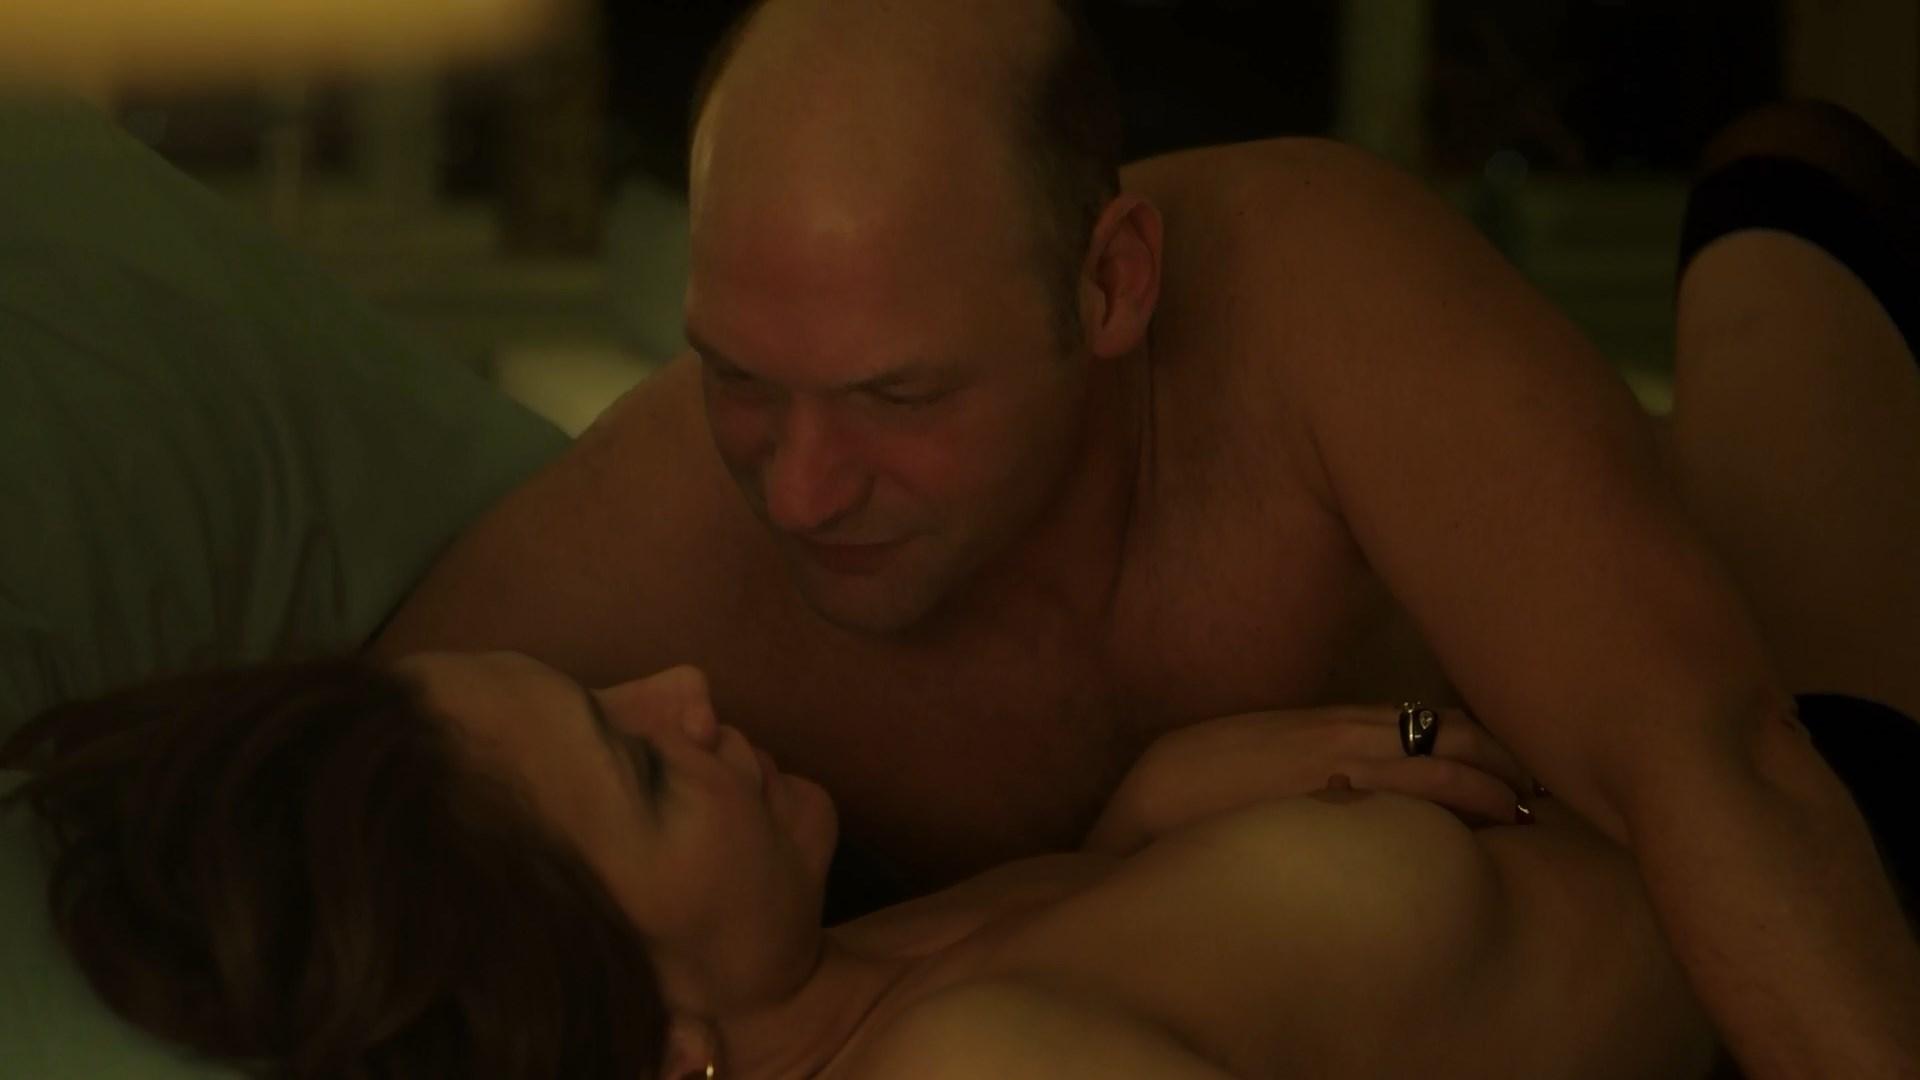 Maggie Gyllenhaal nude - The Deuce s03e03 (2019)